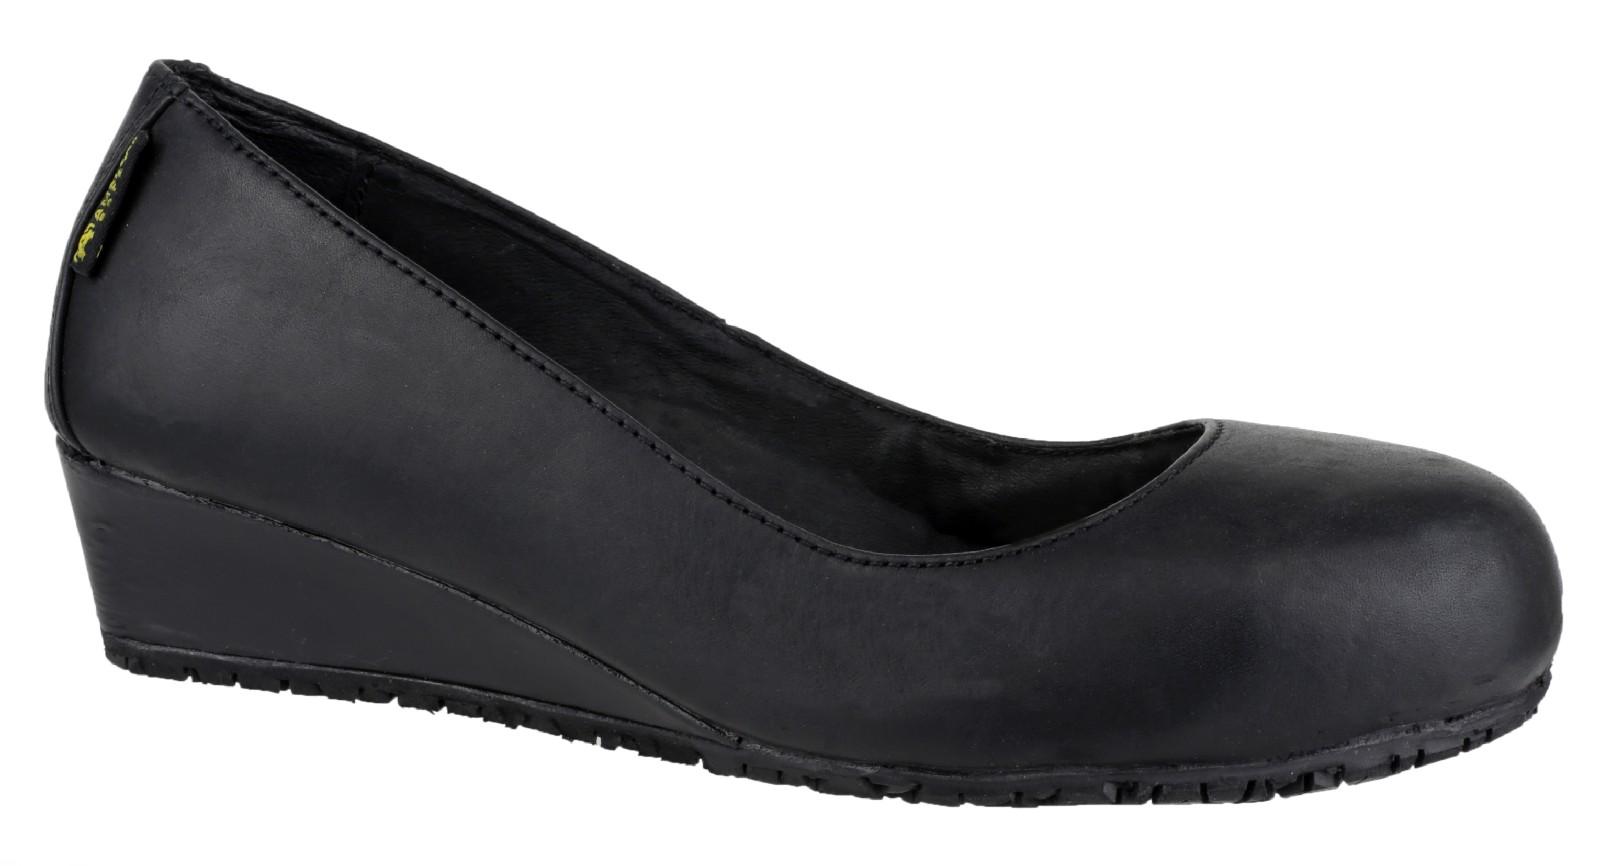 Ambler Fs 107 Schuhe Damen Ferse Safety Schuhe 107 b8c066